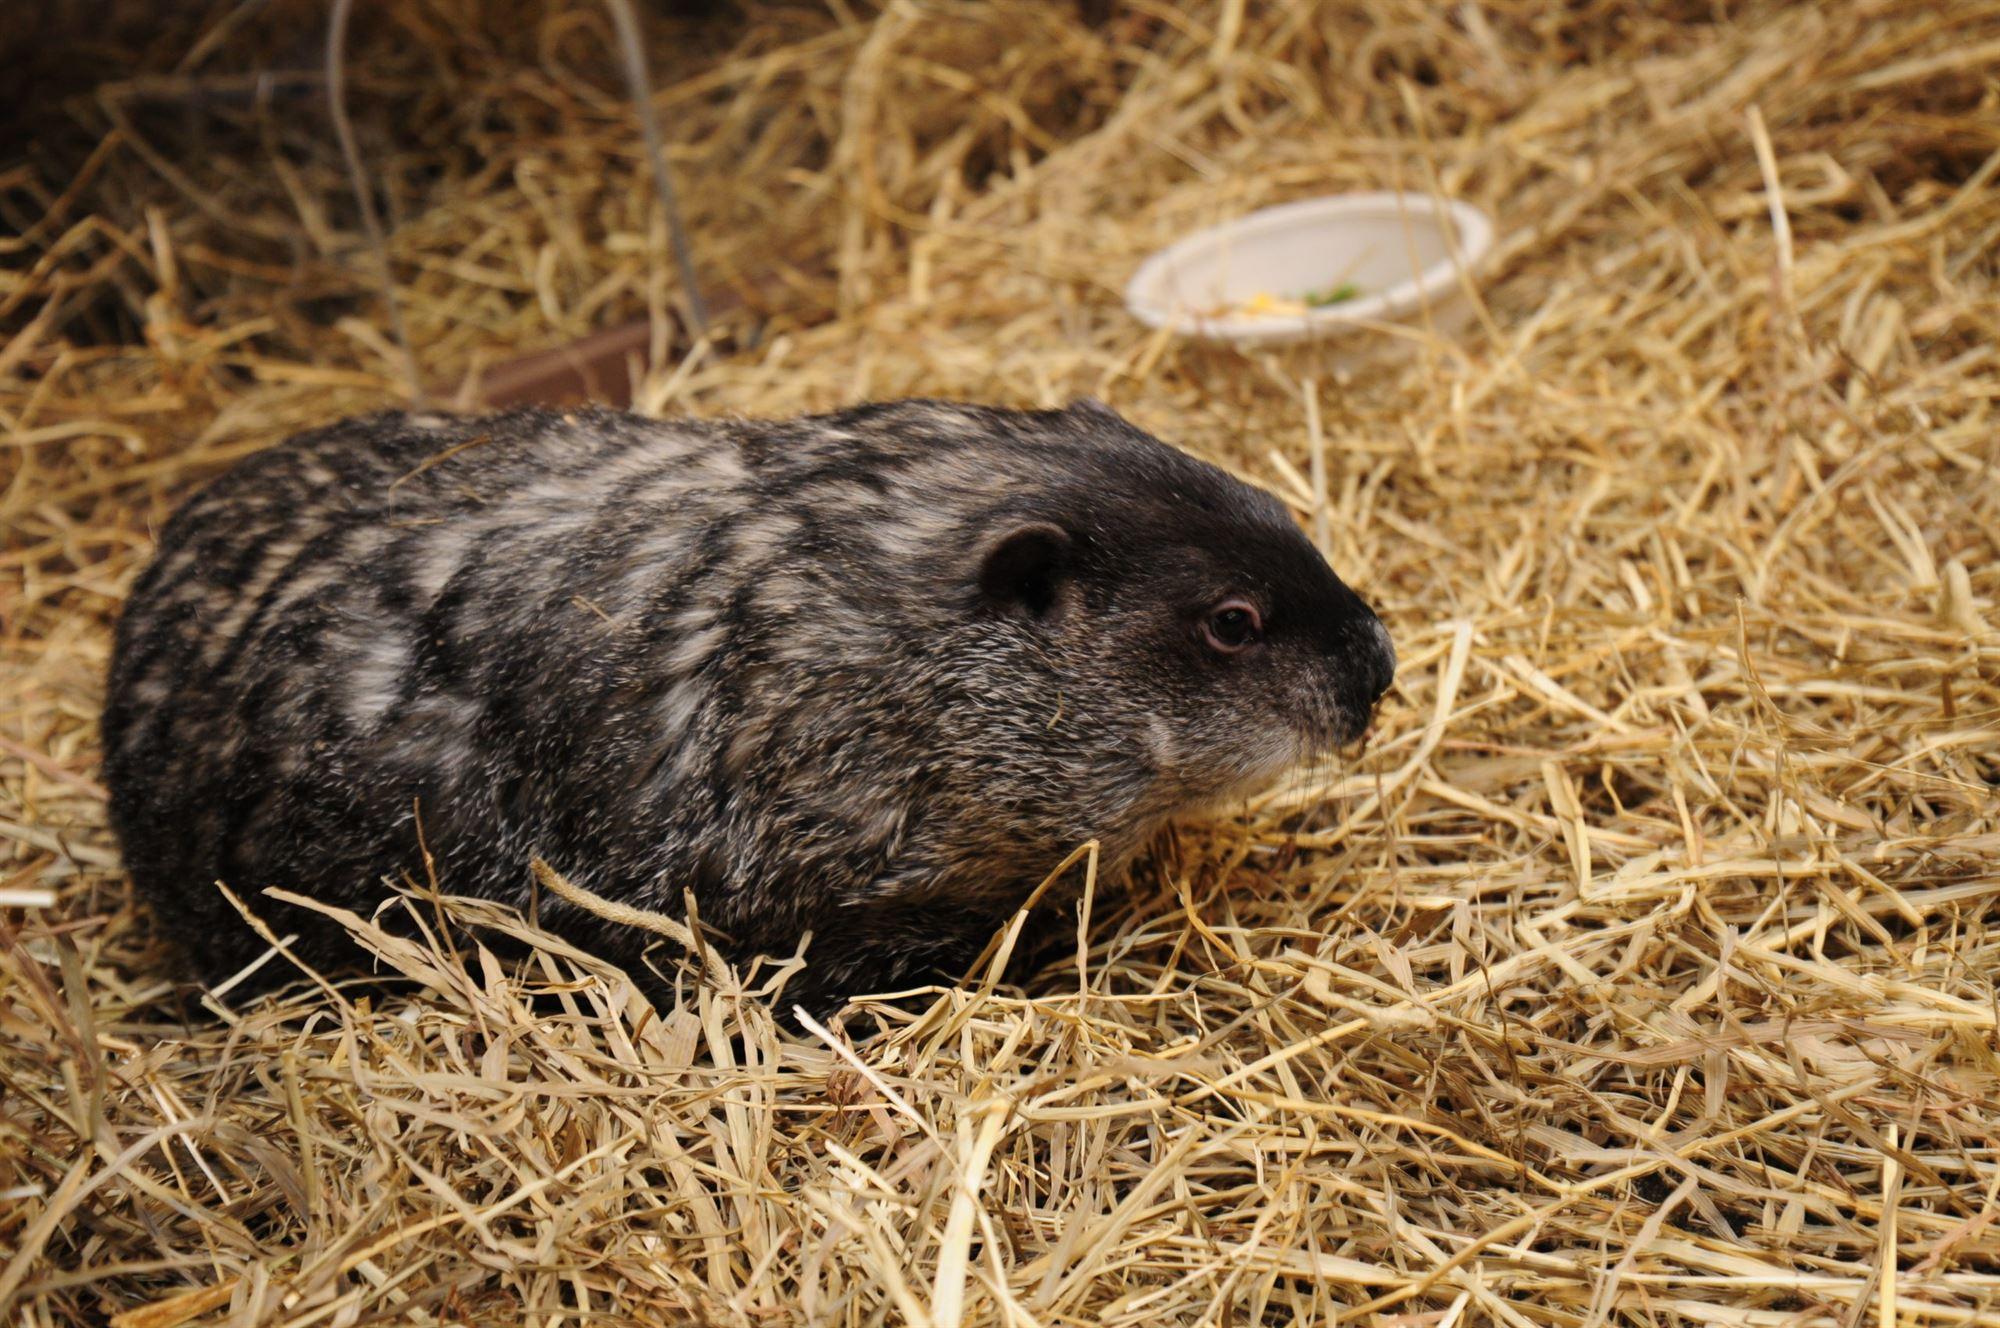 Essex Ed the Groundhog